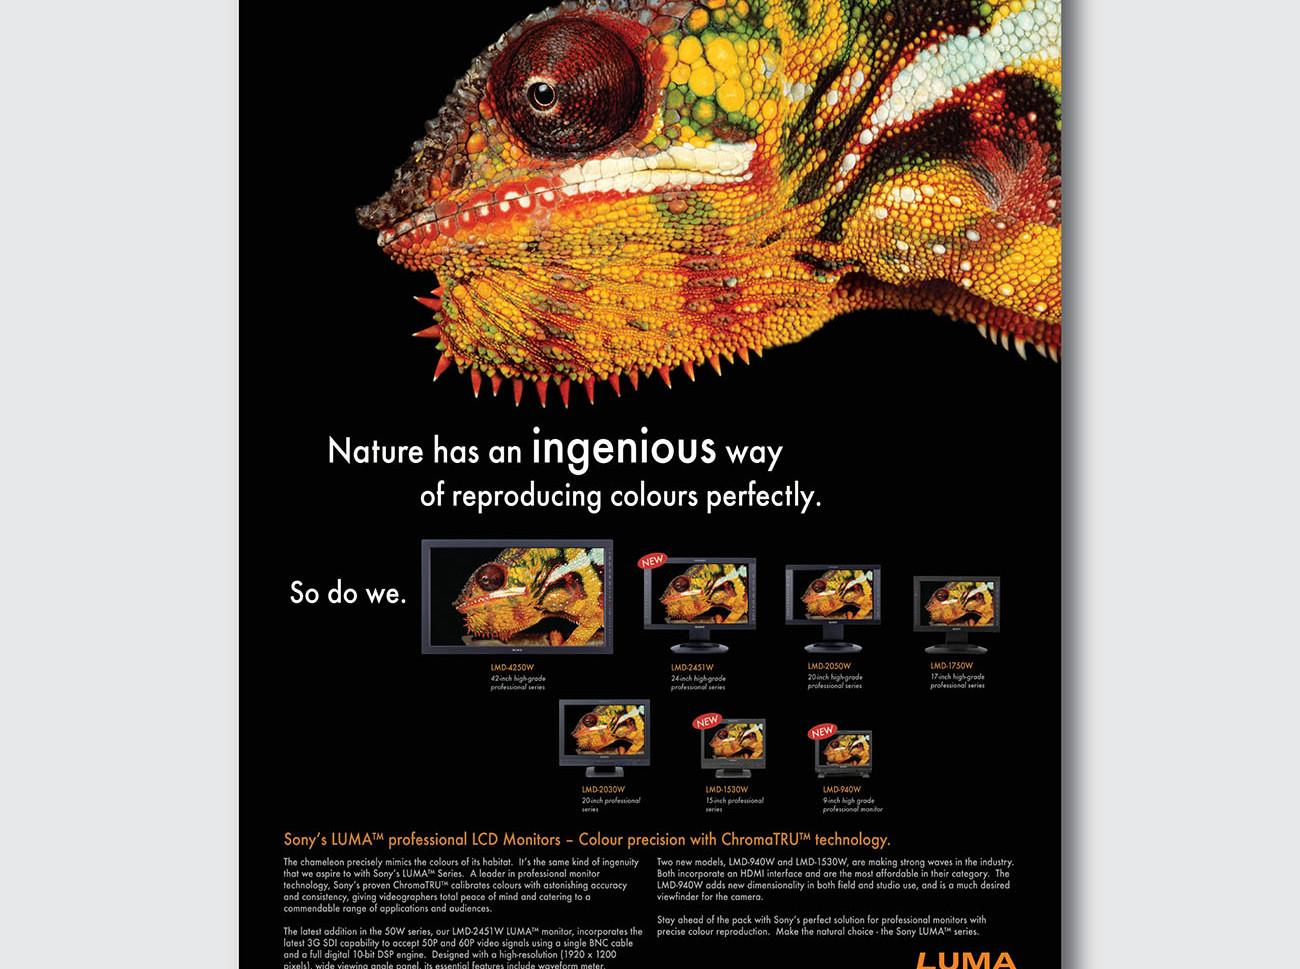 ads-02.jpg